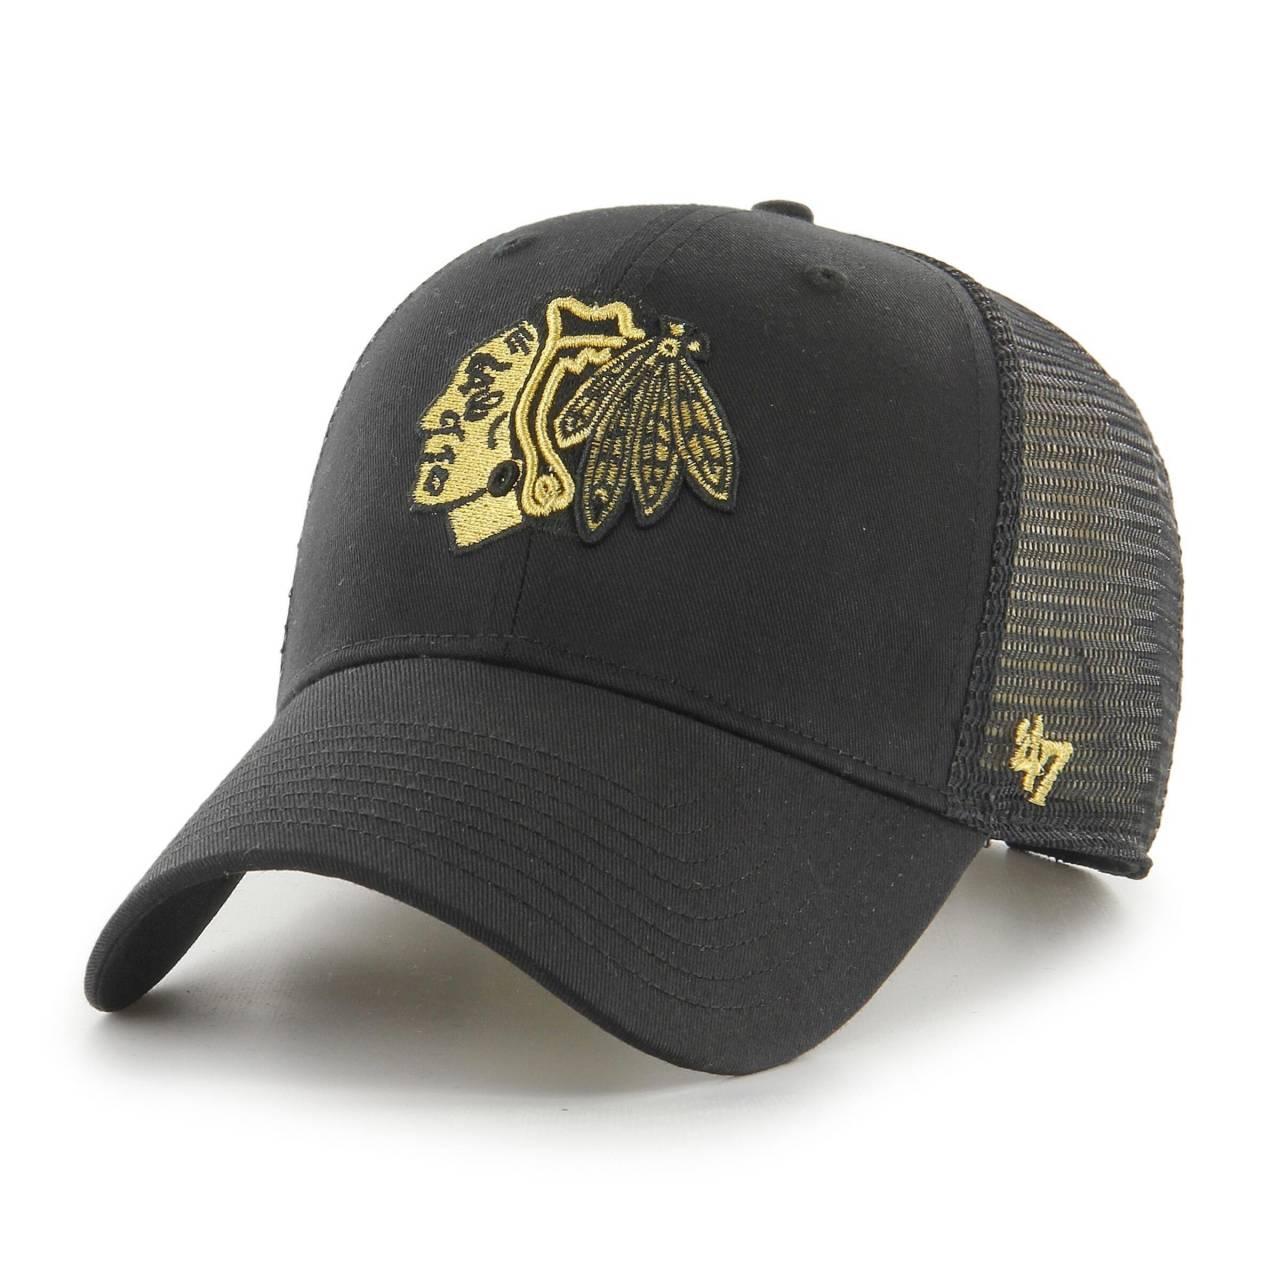 NHL CHICAGO BLACKHAWKS BRANSON METALLIC '47 MVP BLACK CAP